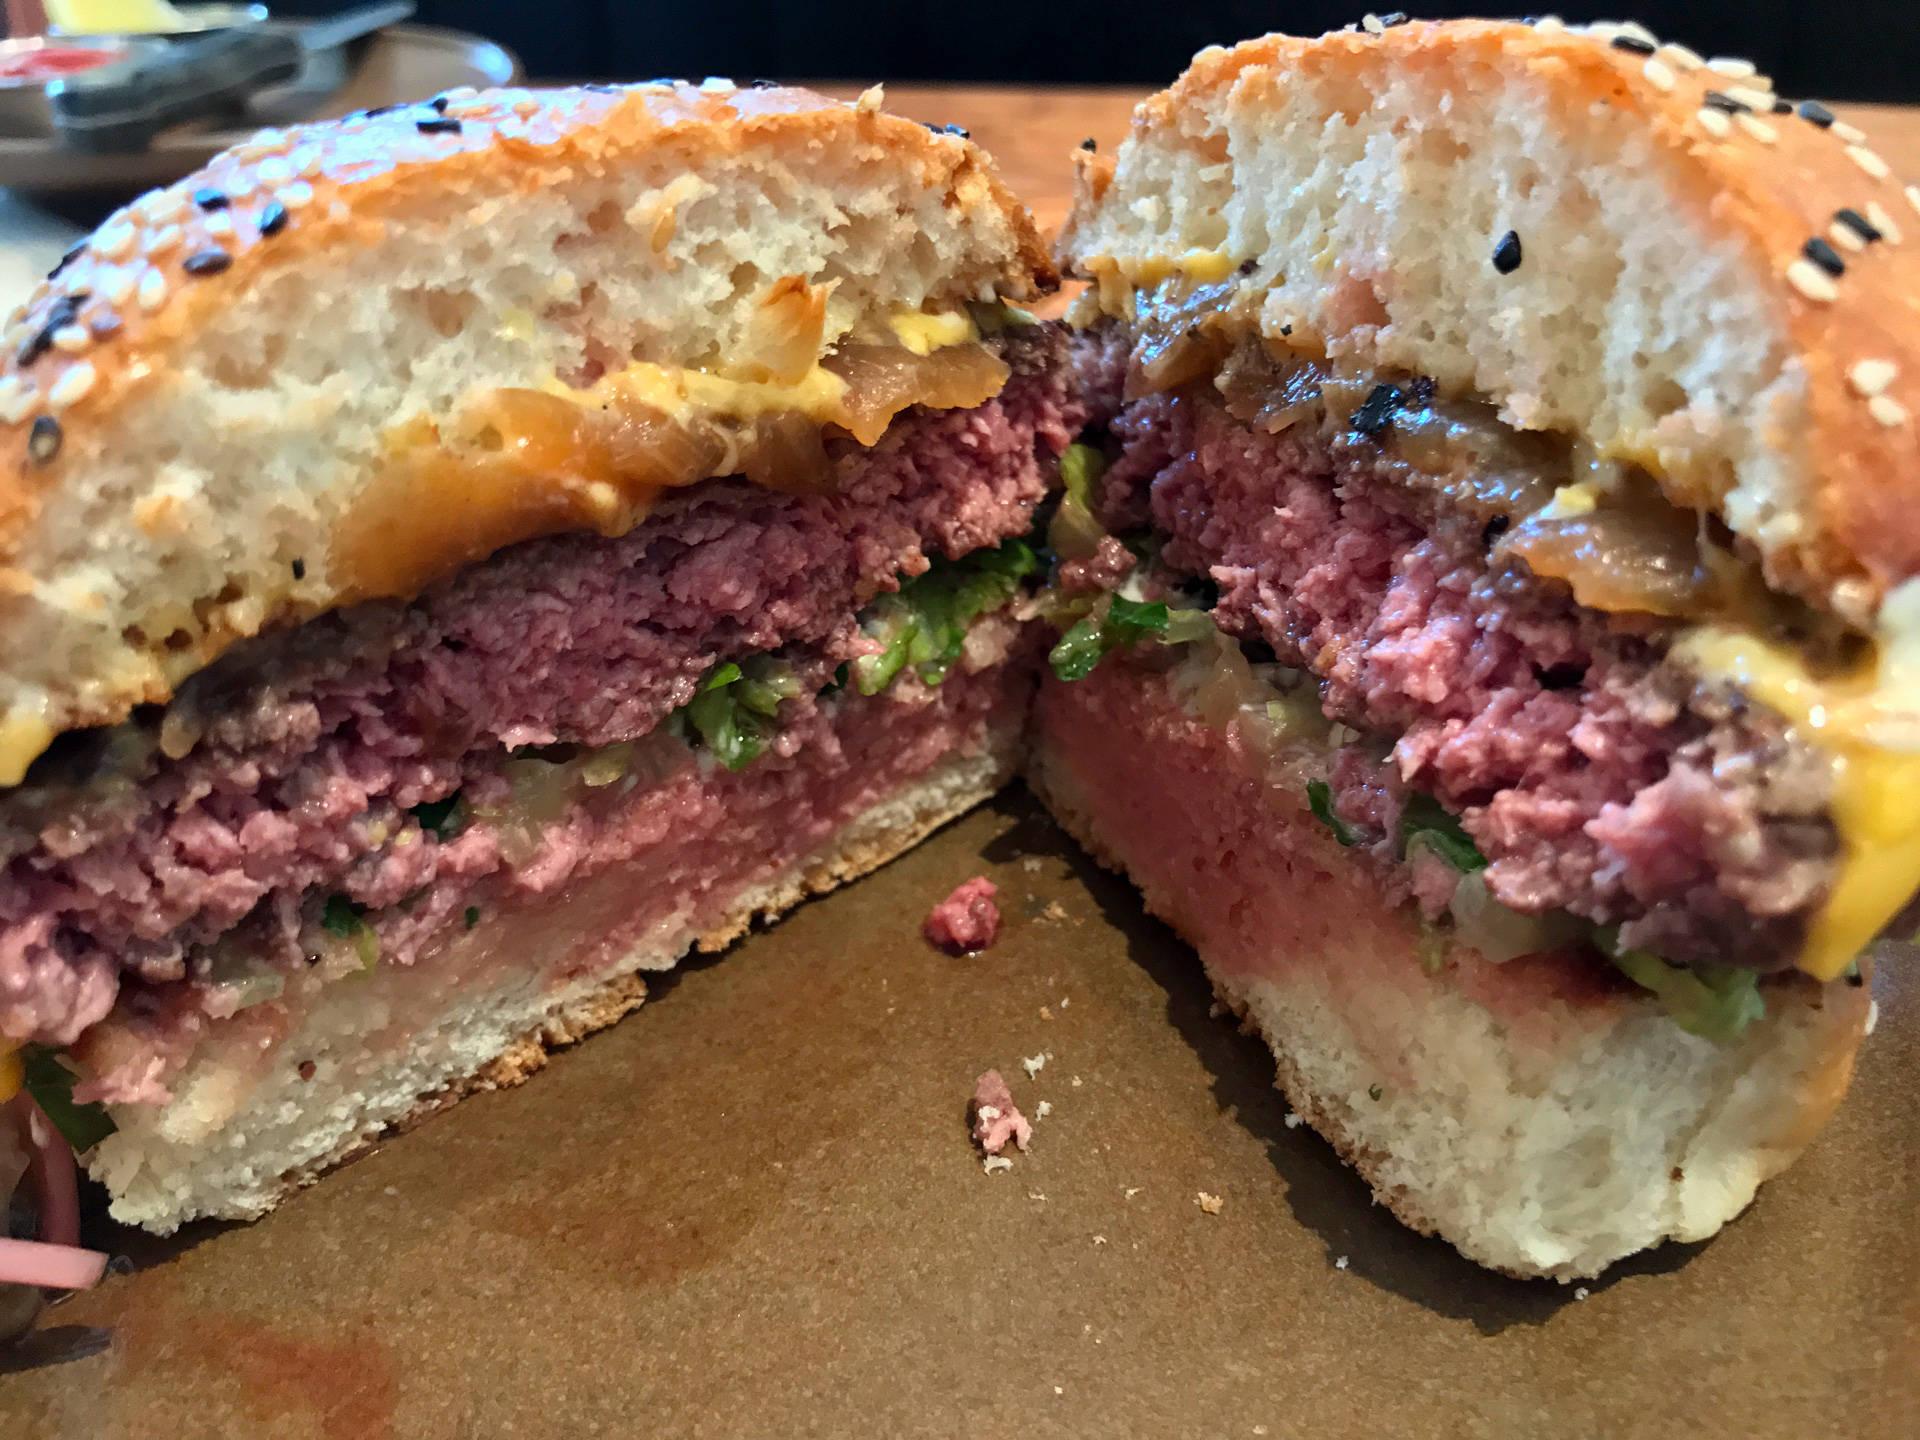 The Wagyu burger at Duchess in Oakland. Kim Westerman